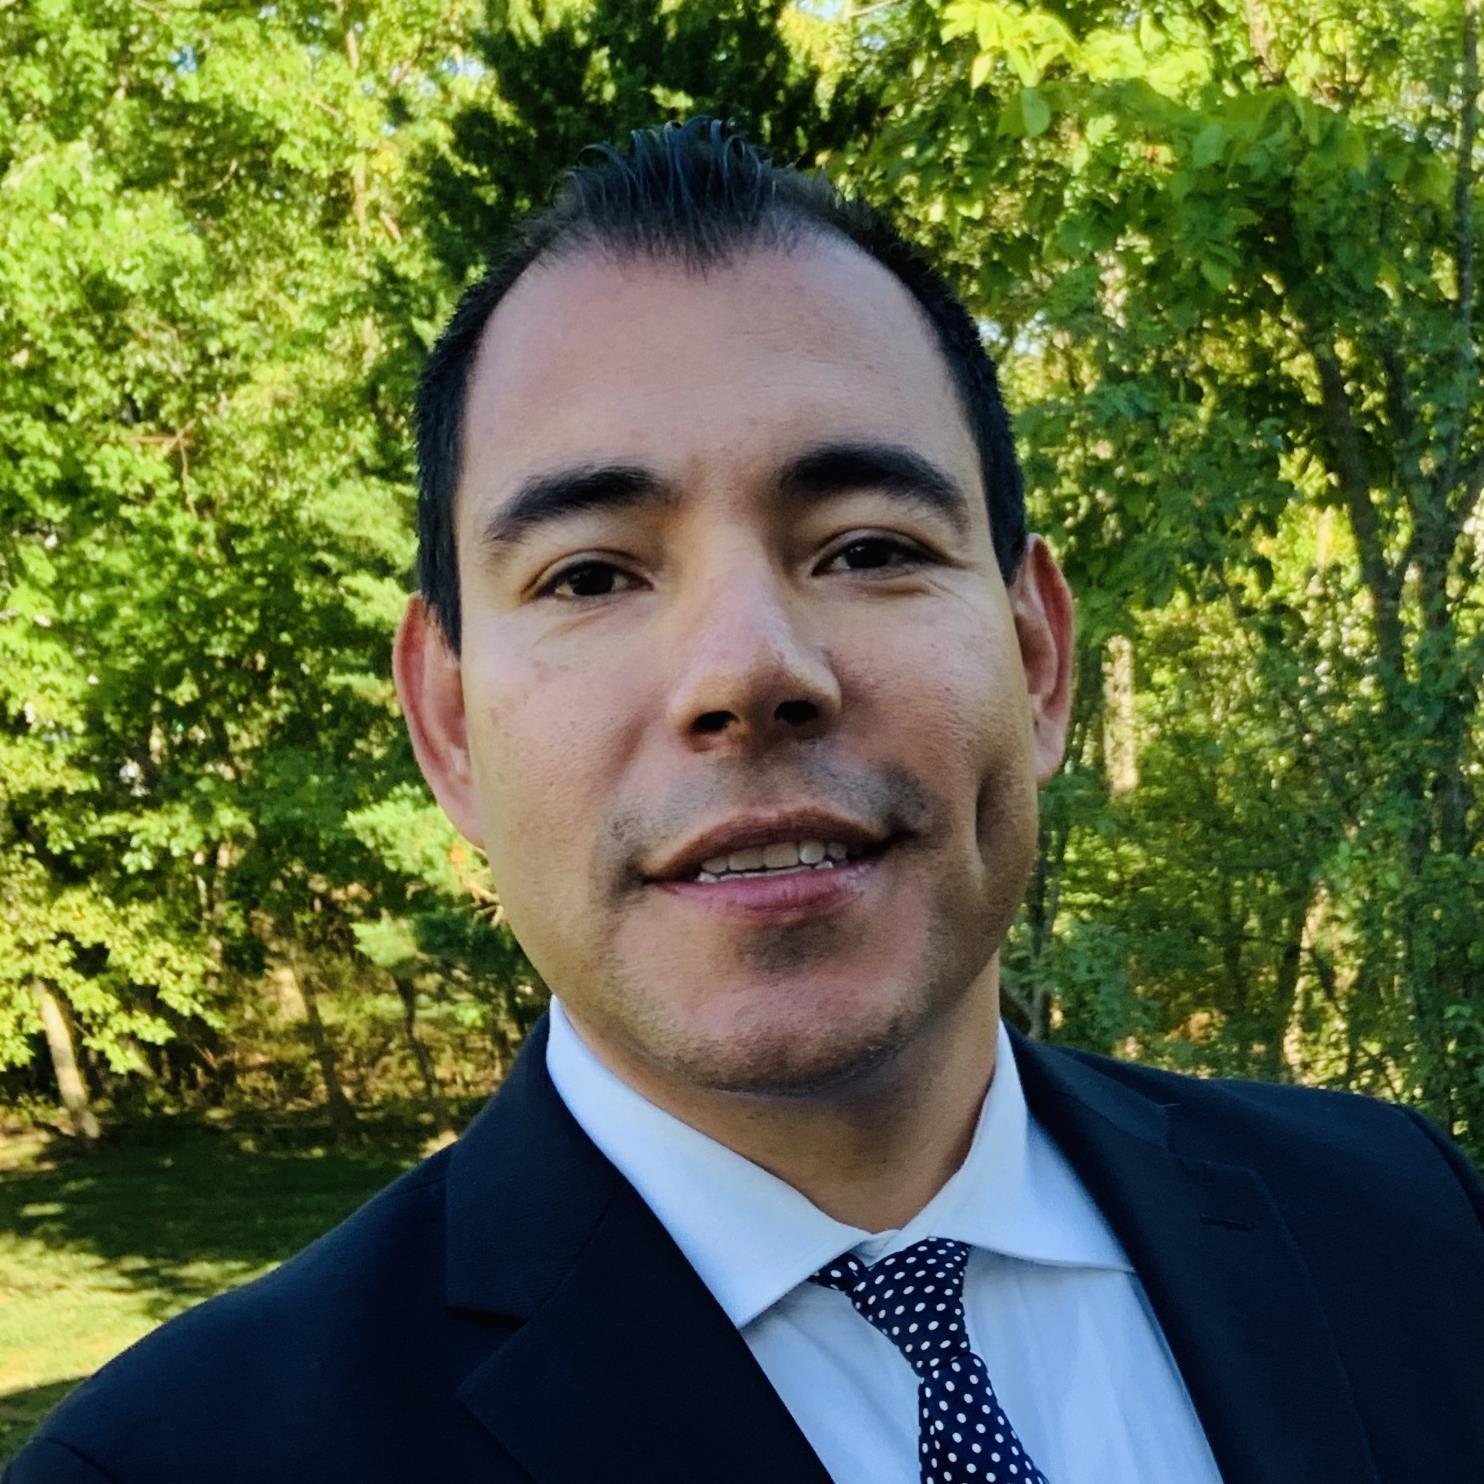 Arturo Carrillo Grupo Bimbo.jpg